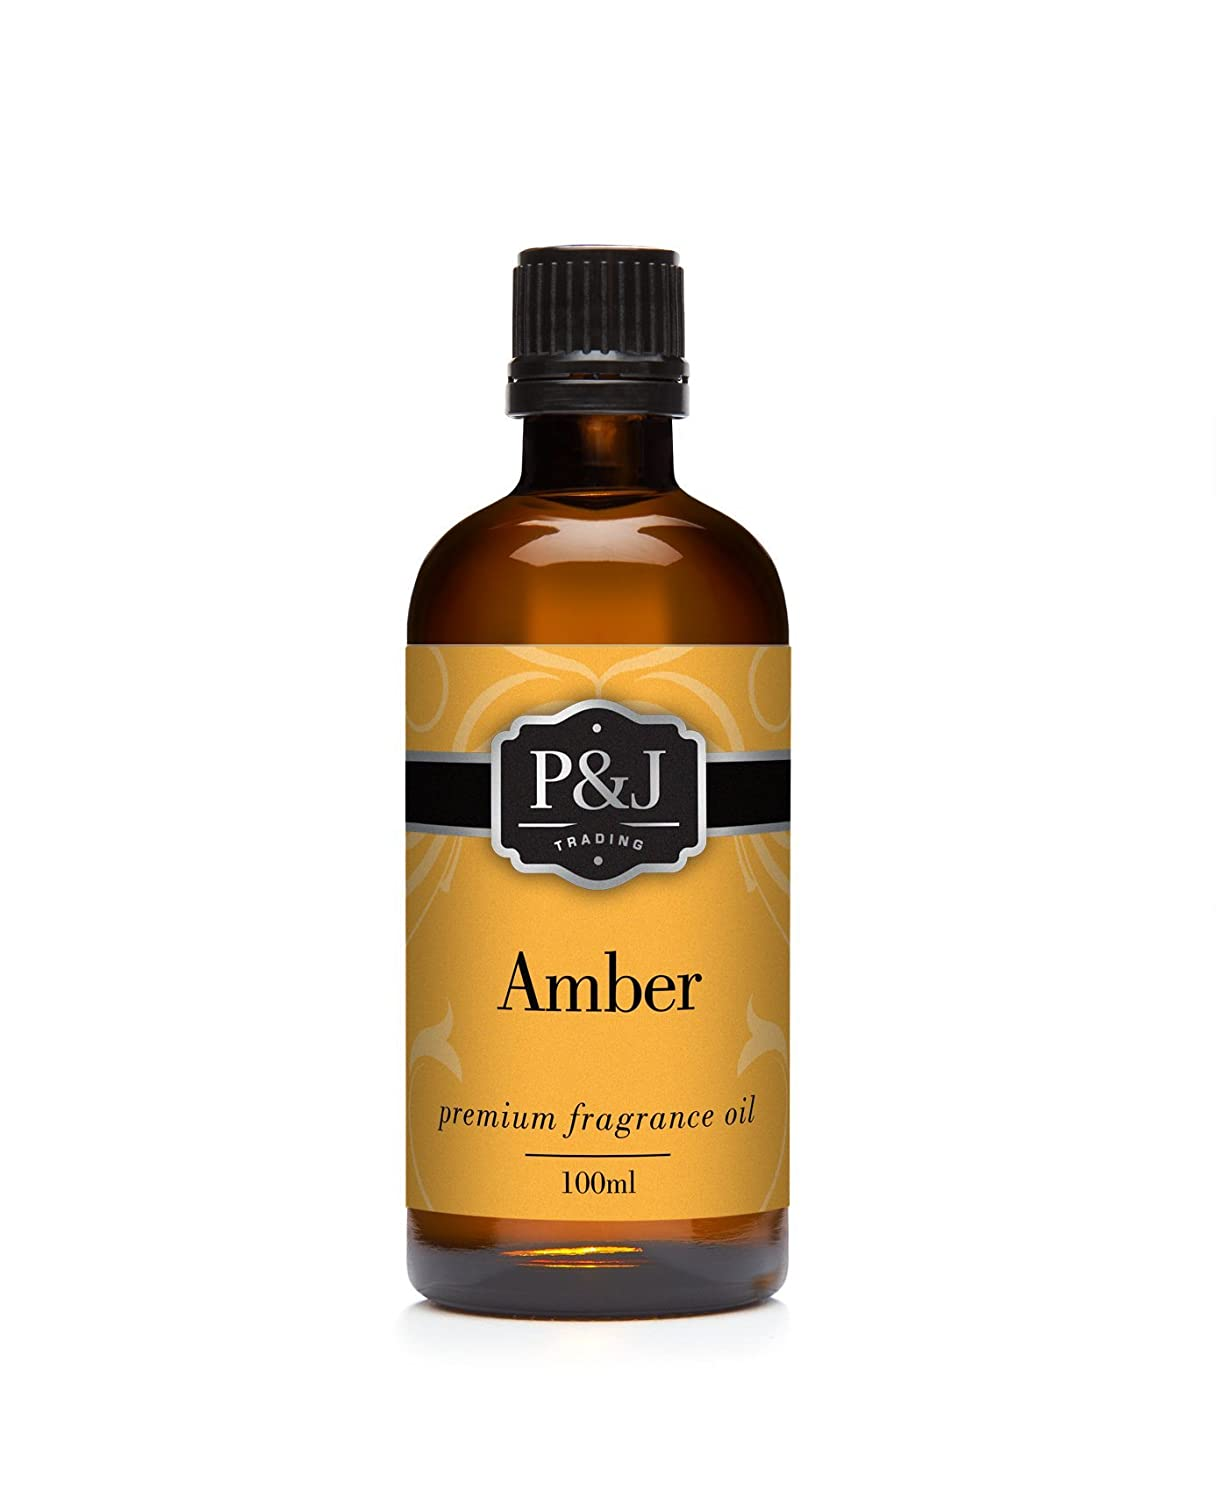 Amber Fragrance Oil - Premium Grade Scented Oil - 100ml/3.3oz